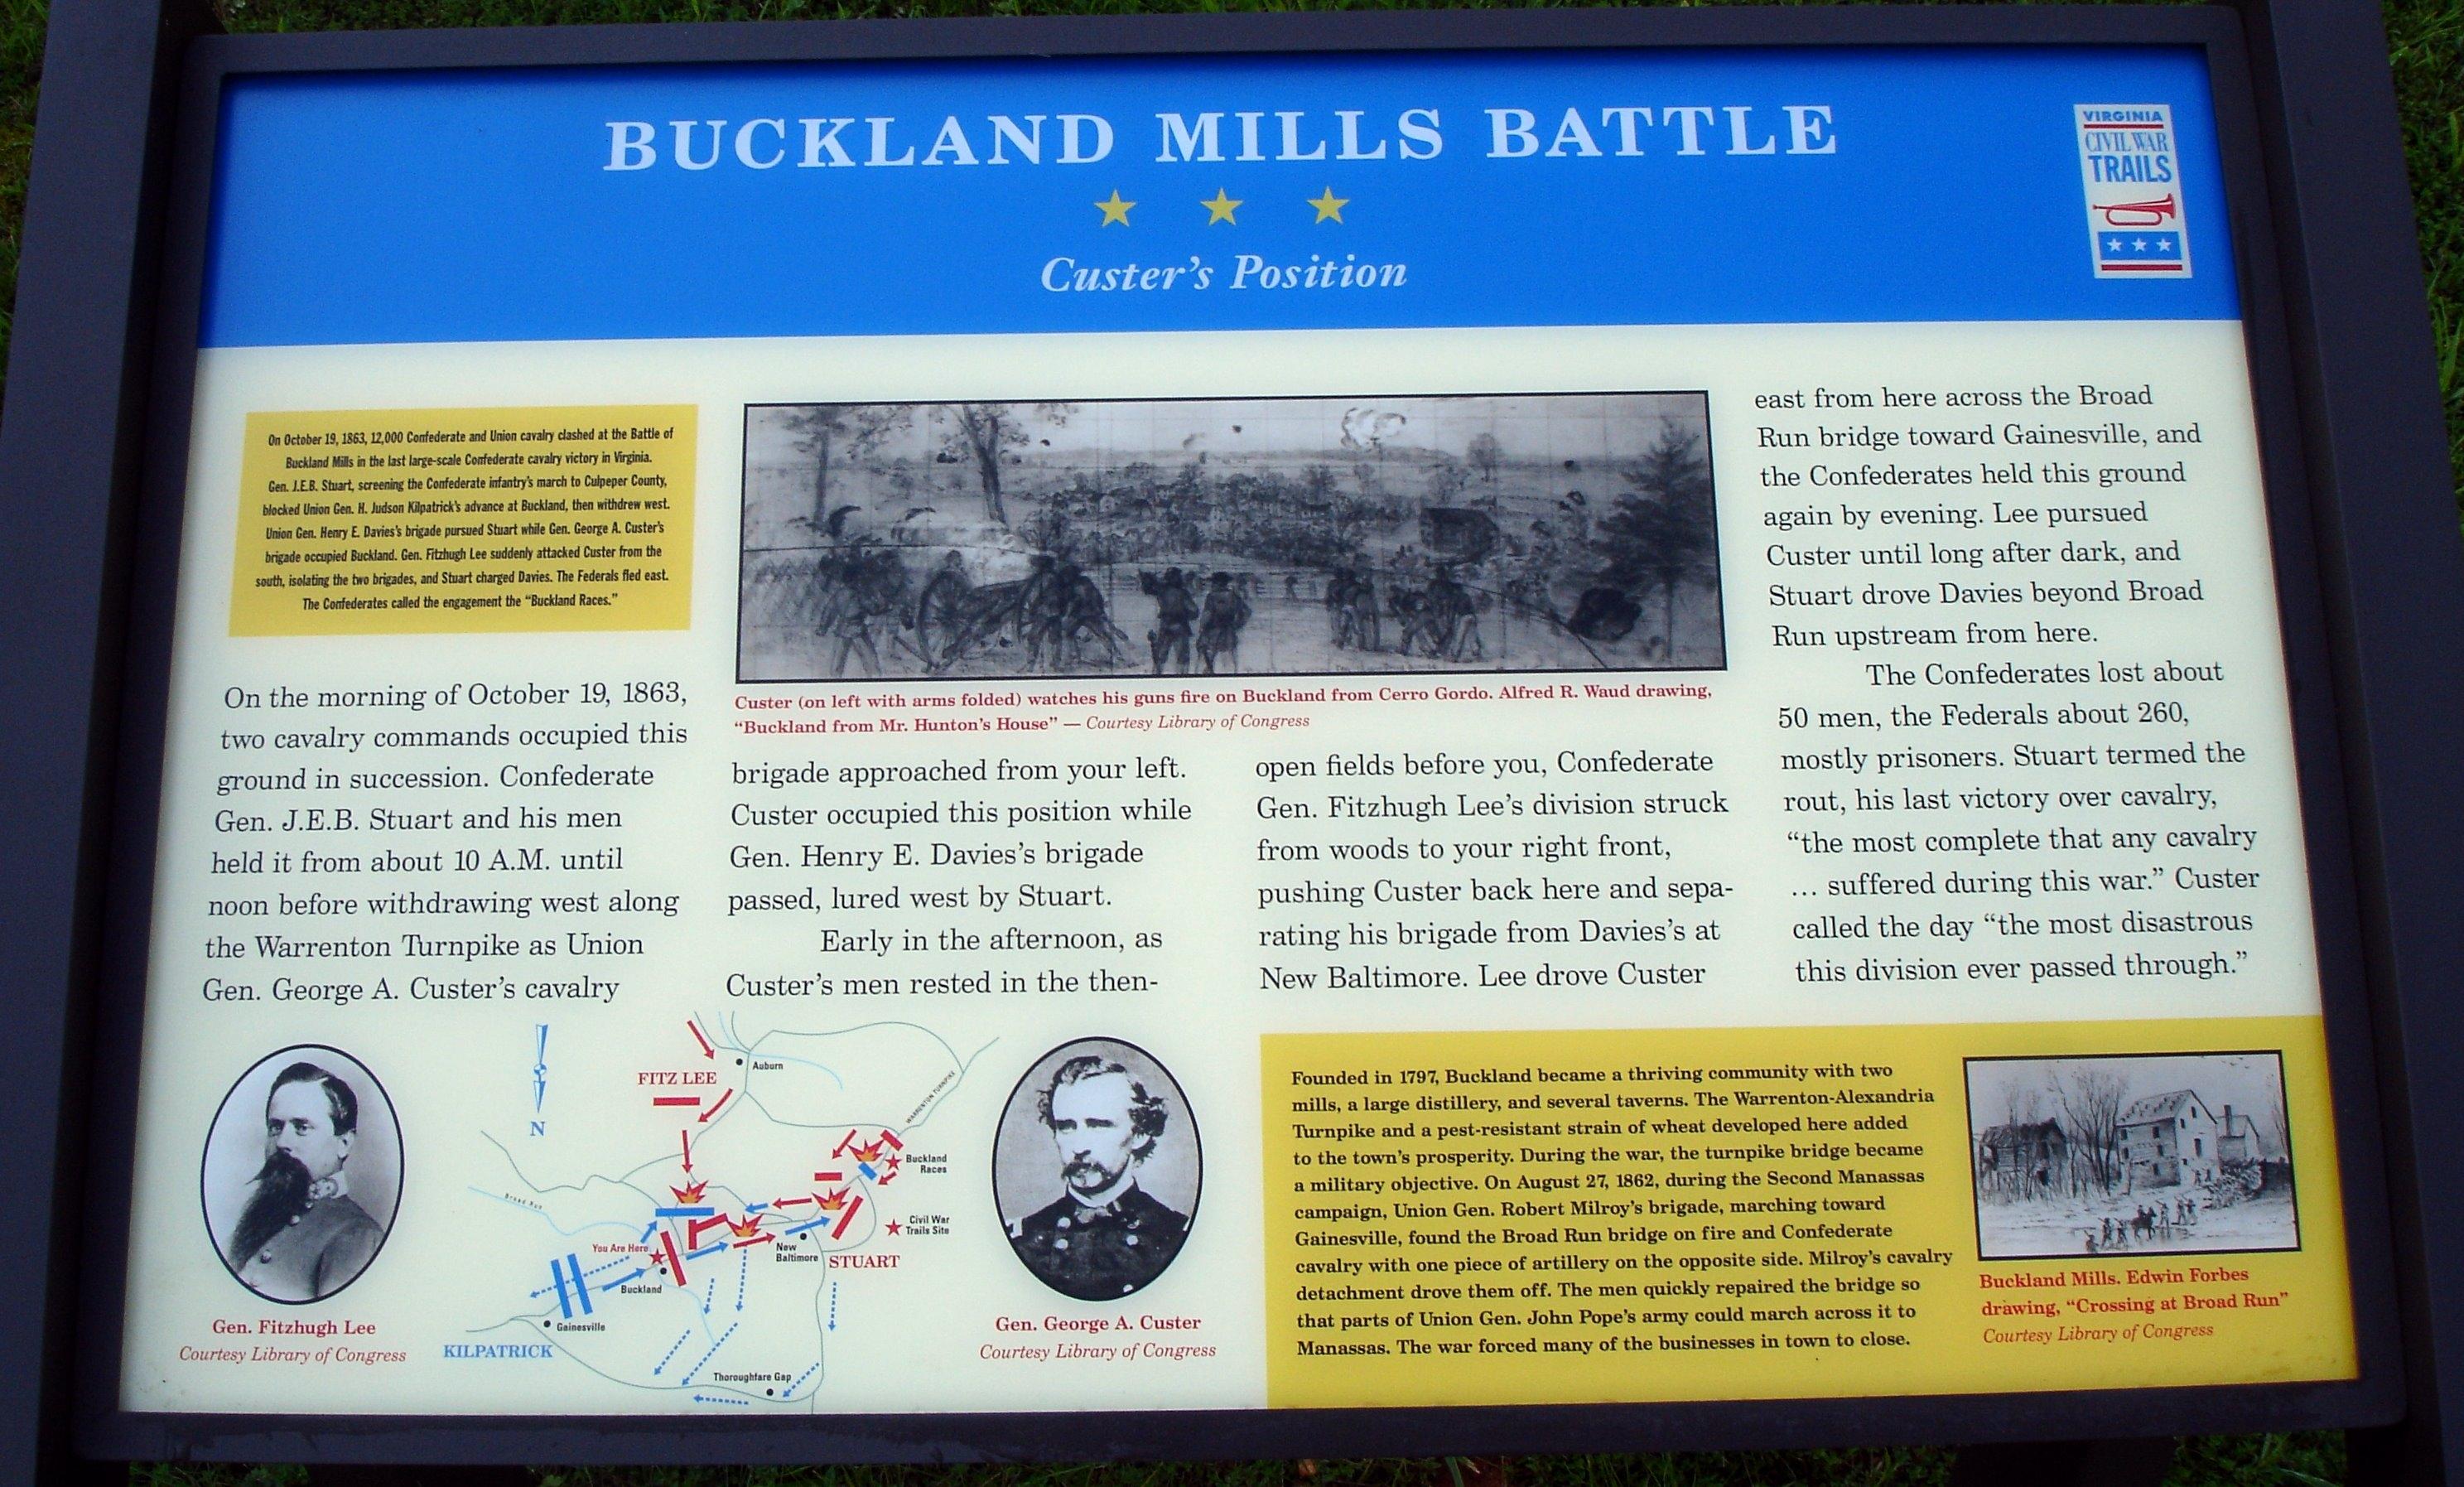 Buckland Mills Battle Marker